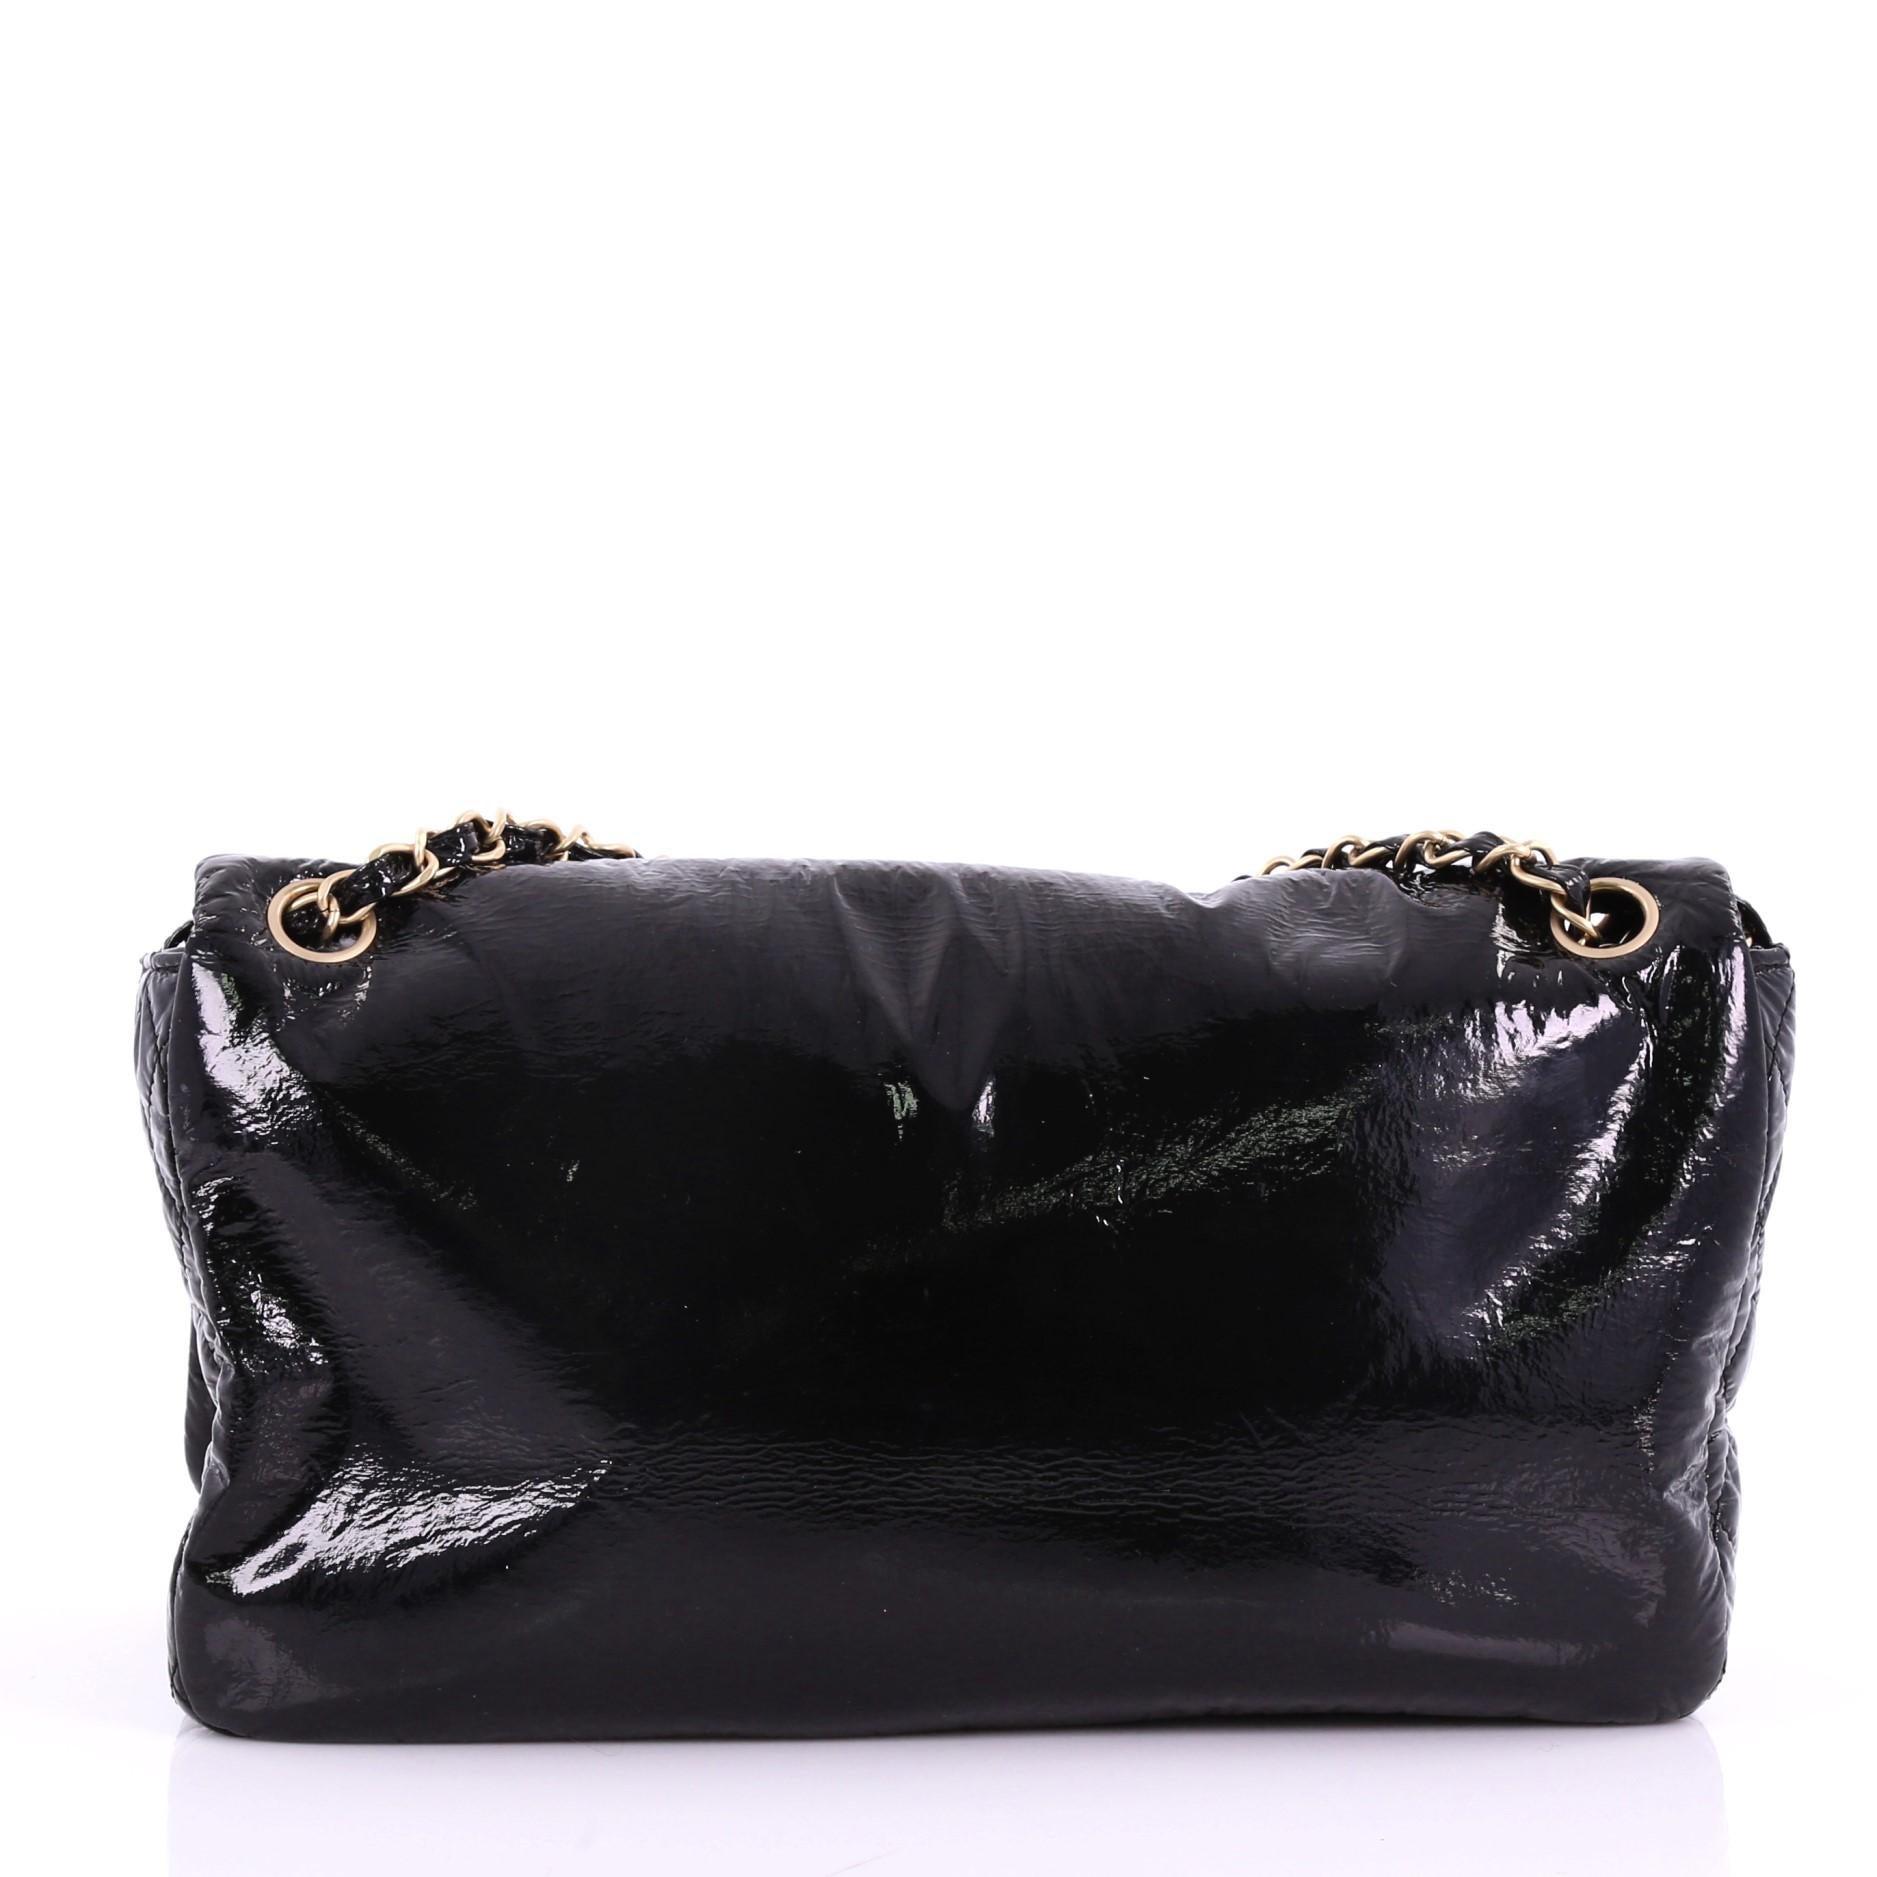 8573e4c50c14 Chanel Rock and Chain Flap Bag Patent Vinyl Medium at 1stdibs